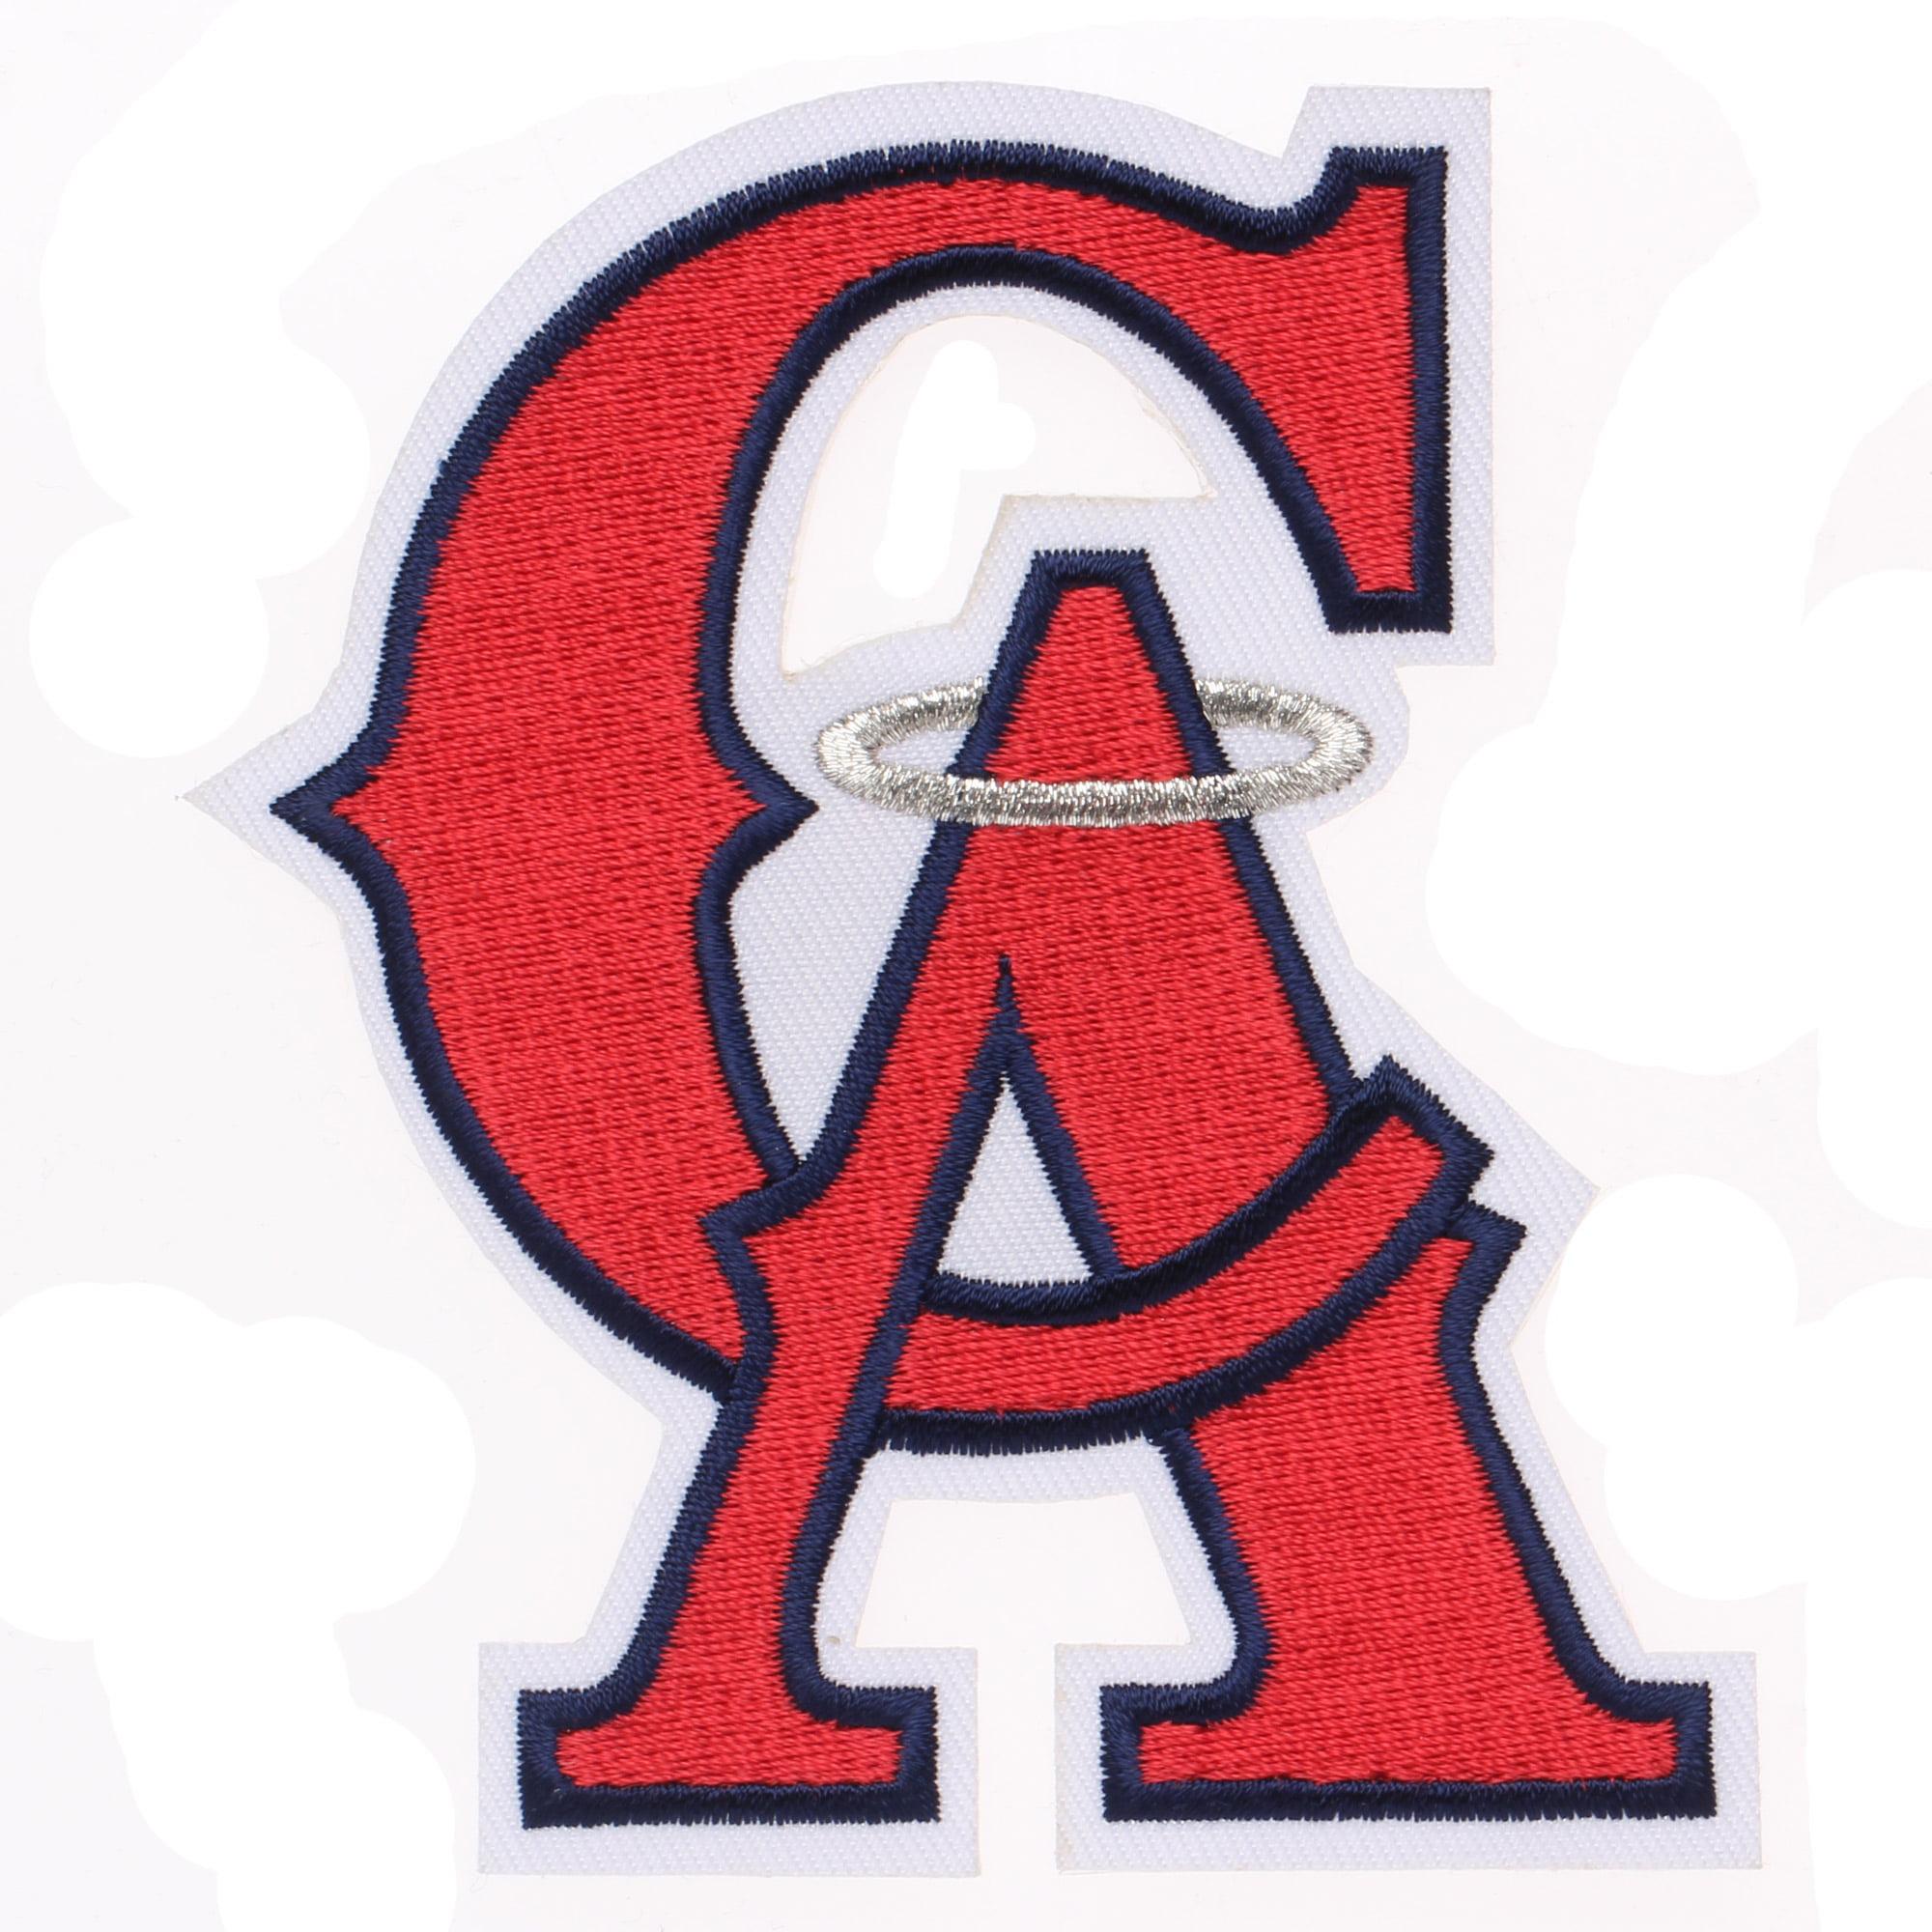 Los Angeles Angels Retro Patch - No Size